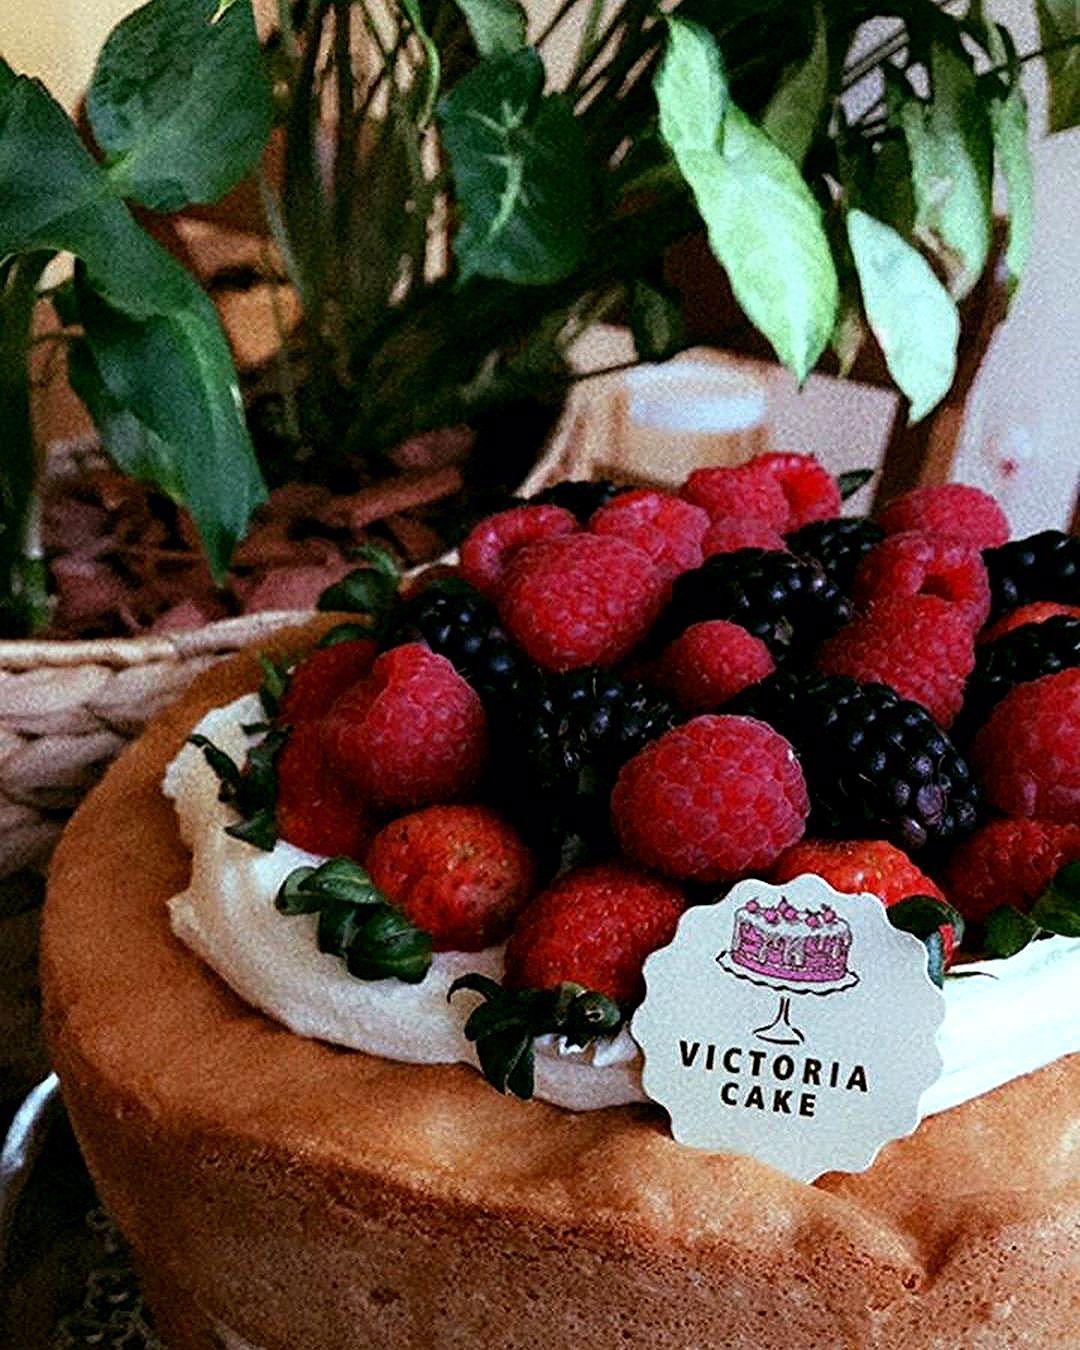 Victoria Cake1 Cakes Jeddah جده فكتوريا كيك كيك كيكة Jeddah Byebyesinglelife Happybithday Congrats هابي بيرثداي Victoria Cakes Food Mini Cheesecake